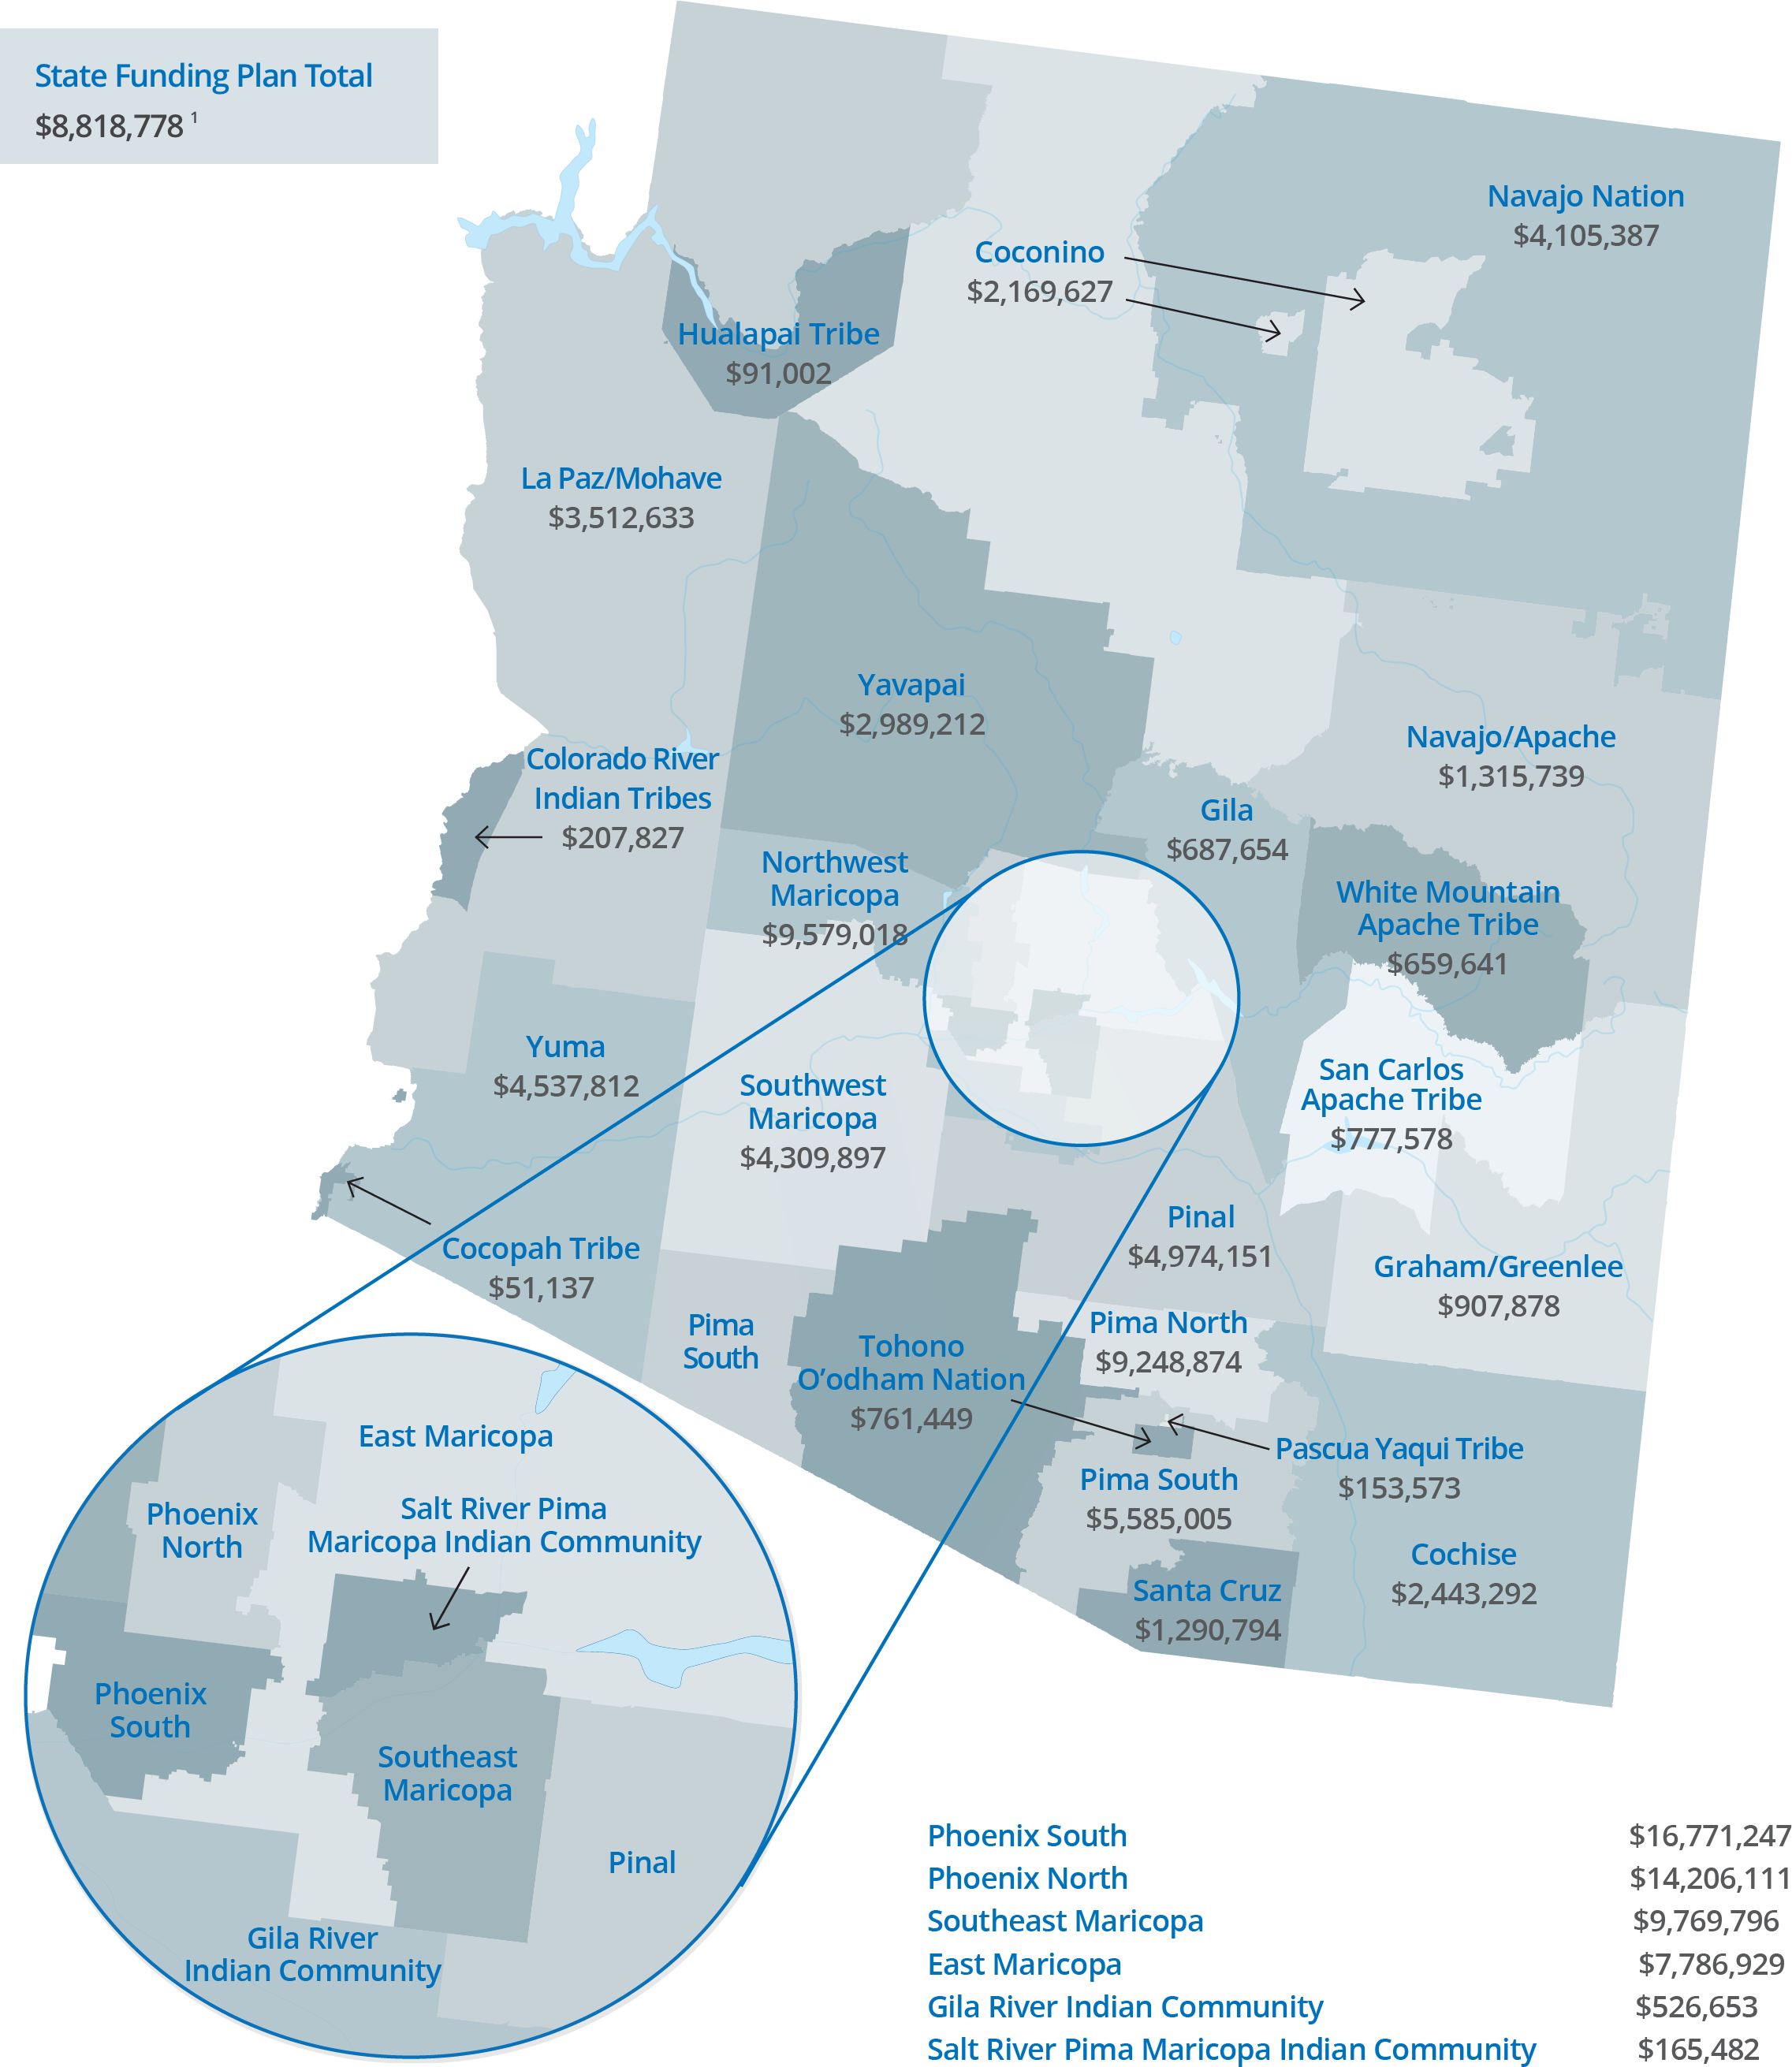 Arizona Regional Map Investments